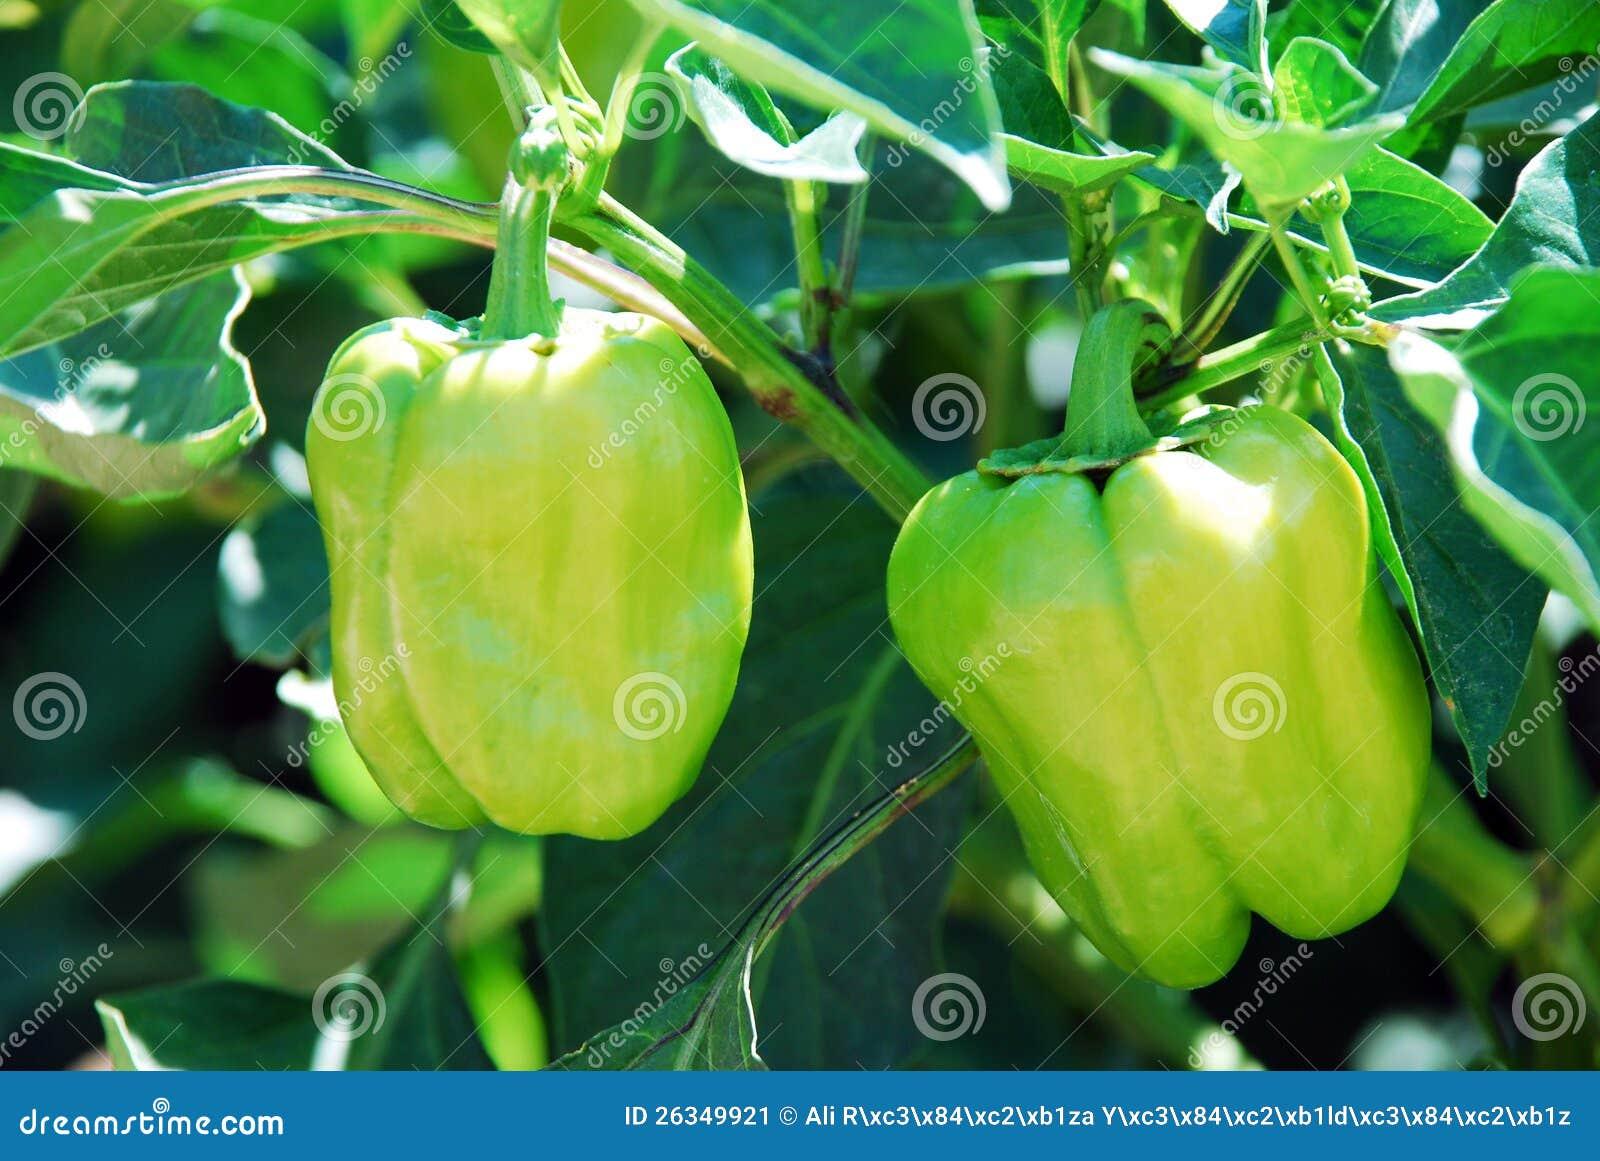 Green Pepper Tree Stock Image - Image: 26349921